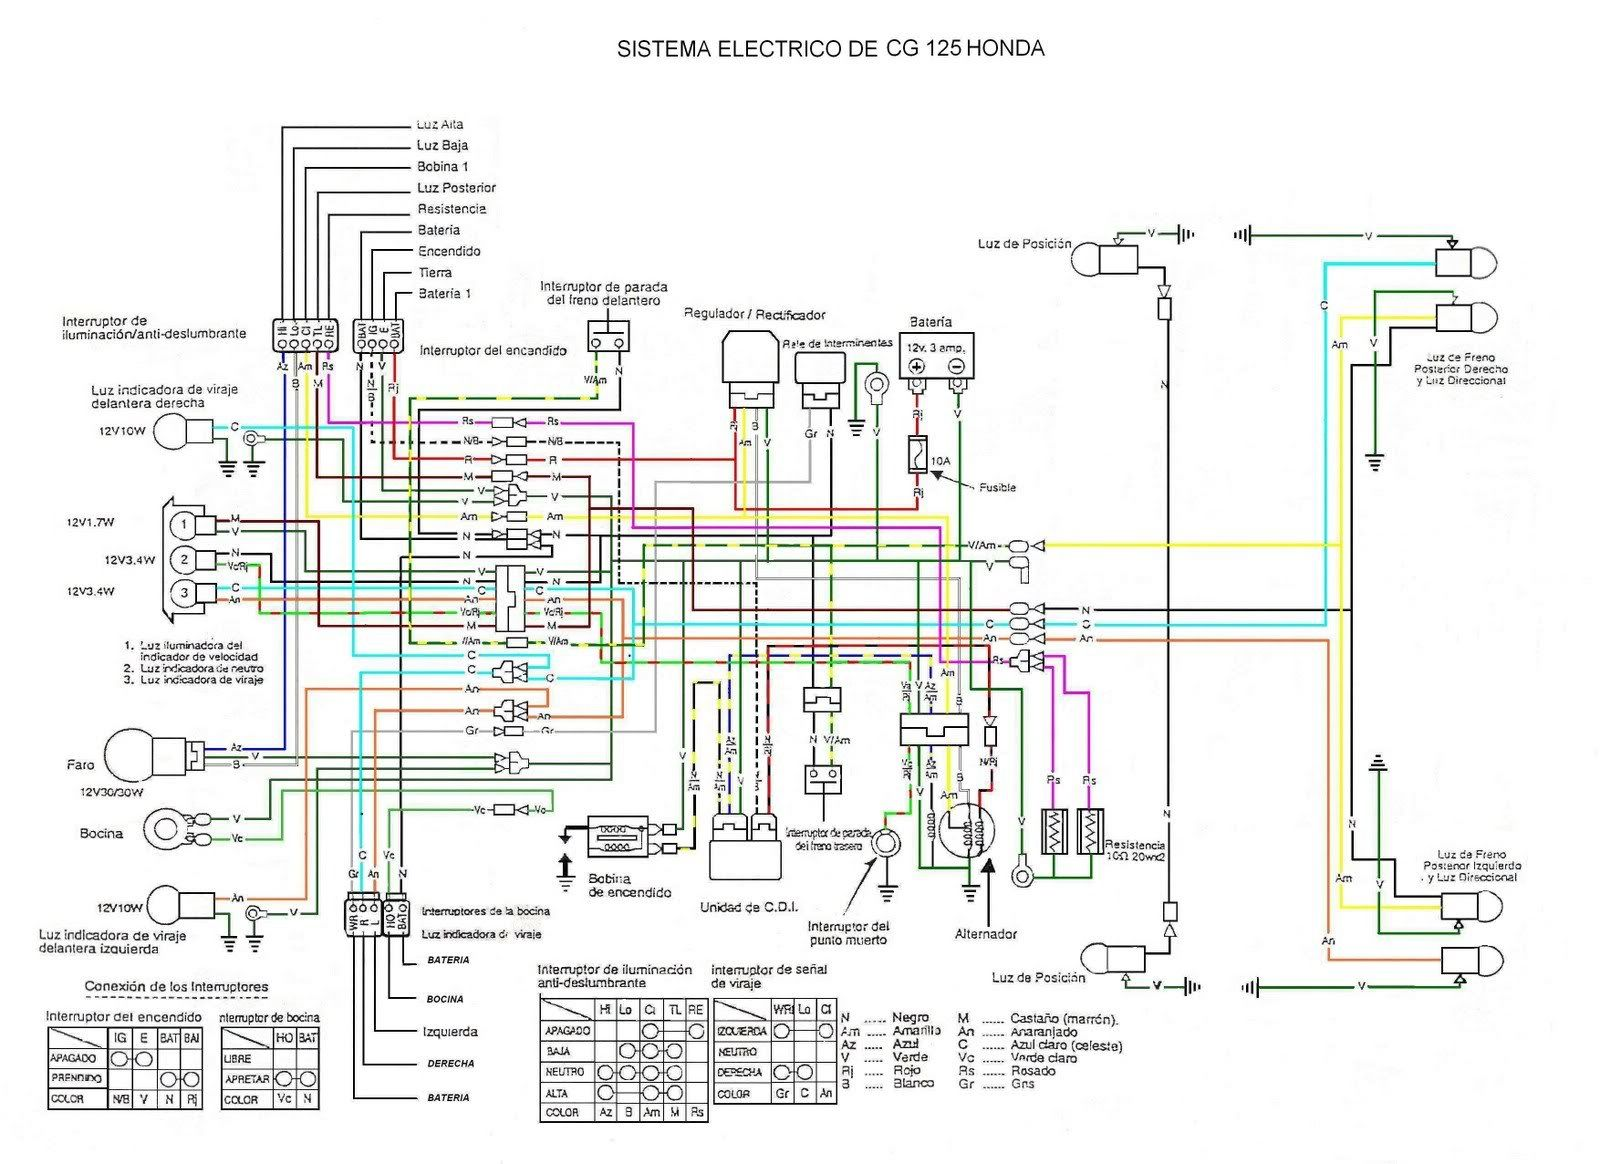 Diagrama o sistema el ctrico de motos chinas China